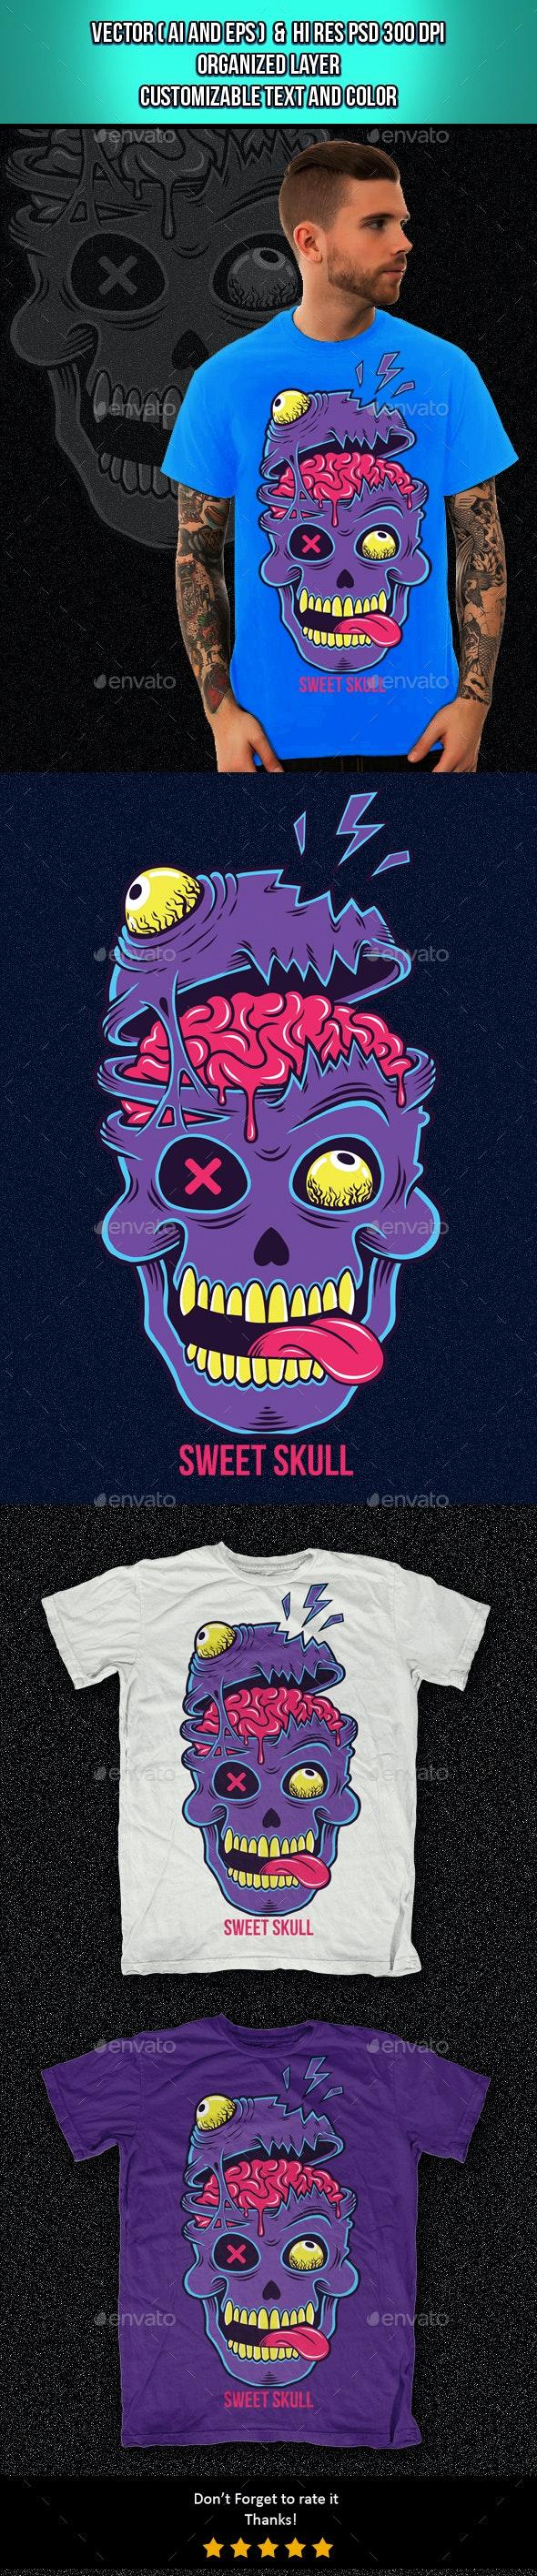 Sweet Skull 2 - Designs T-Shirts